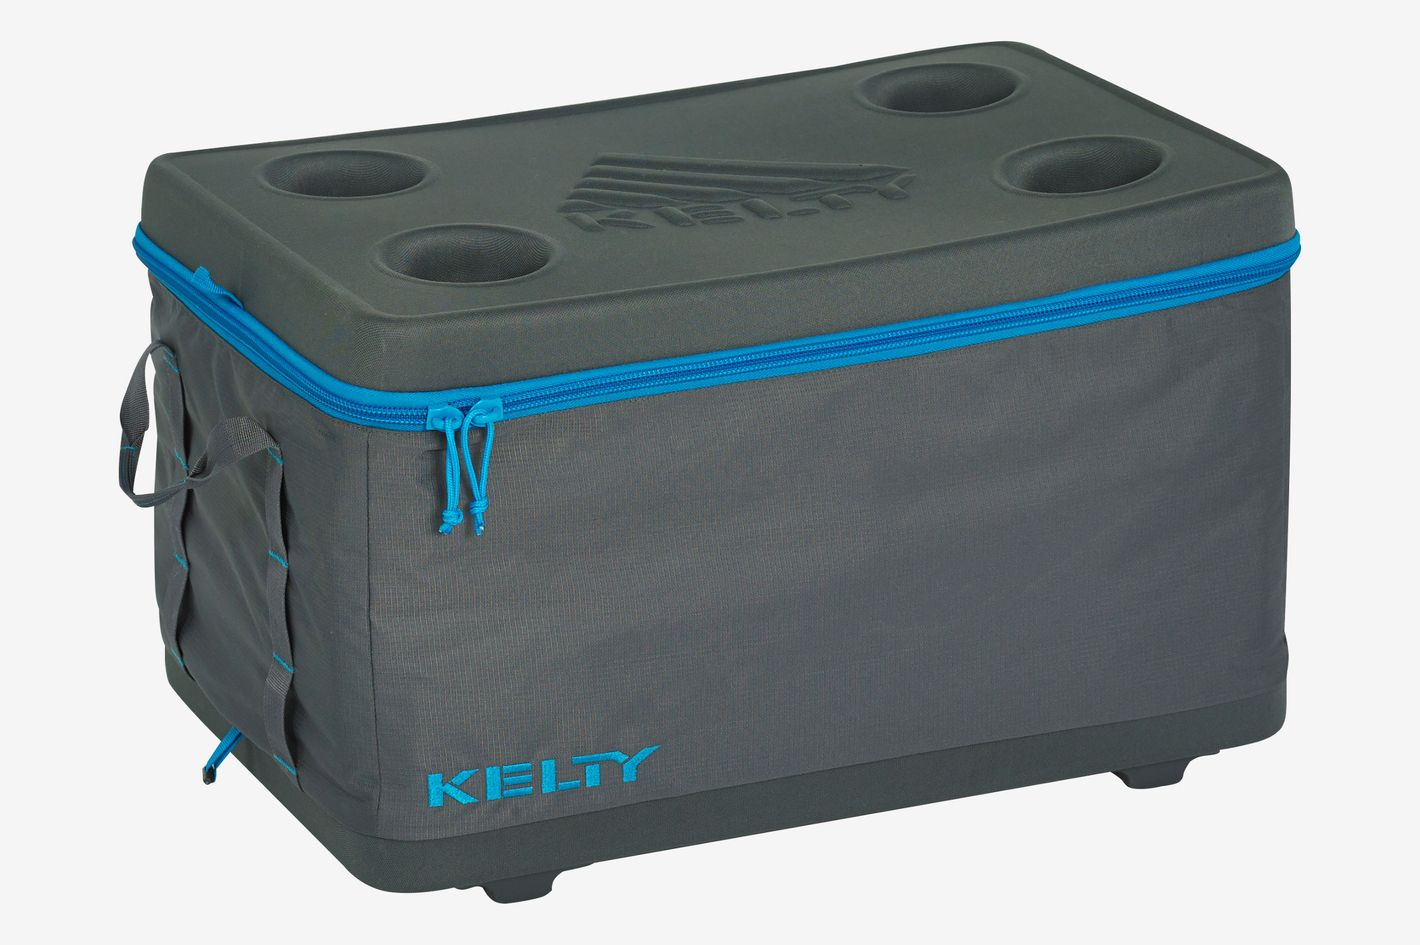 Kelty Large Folding Cooler